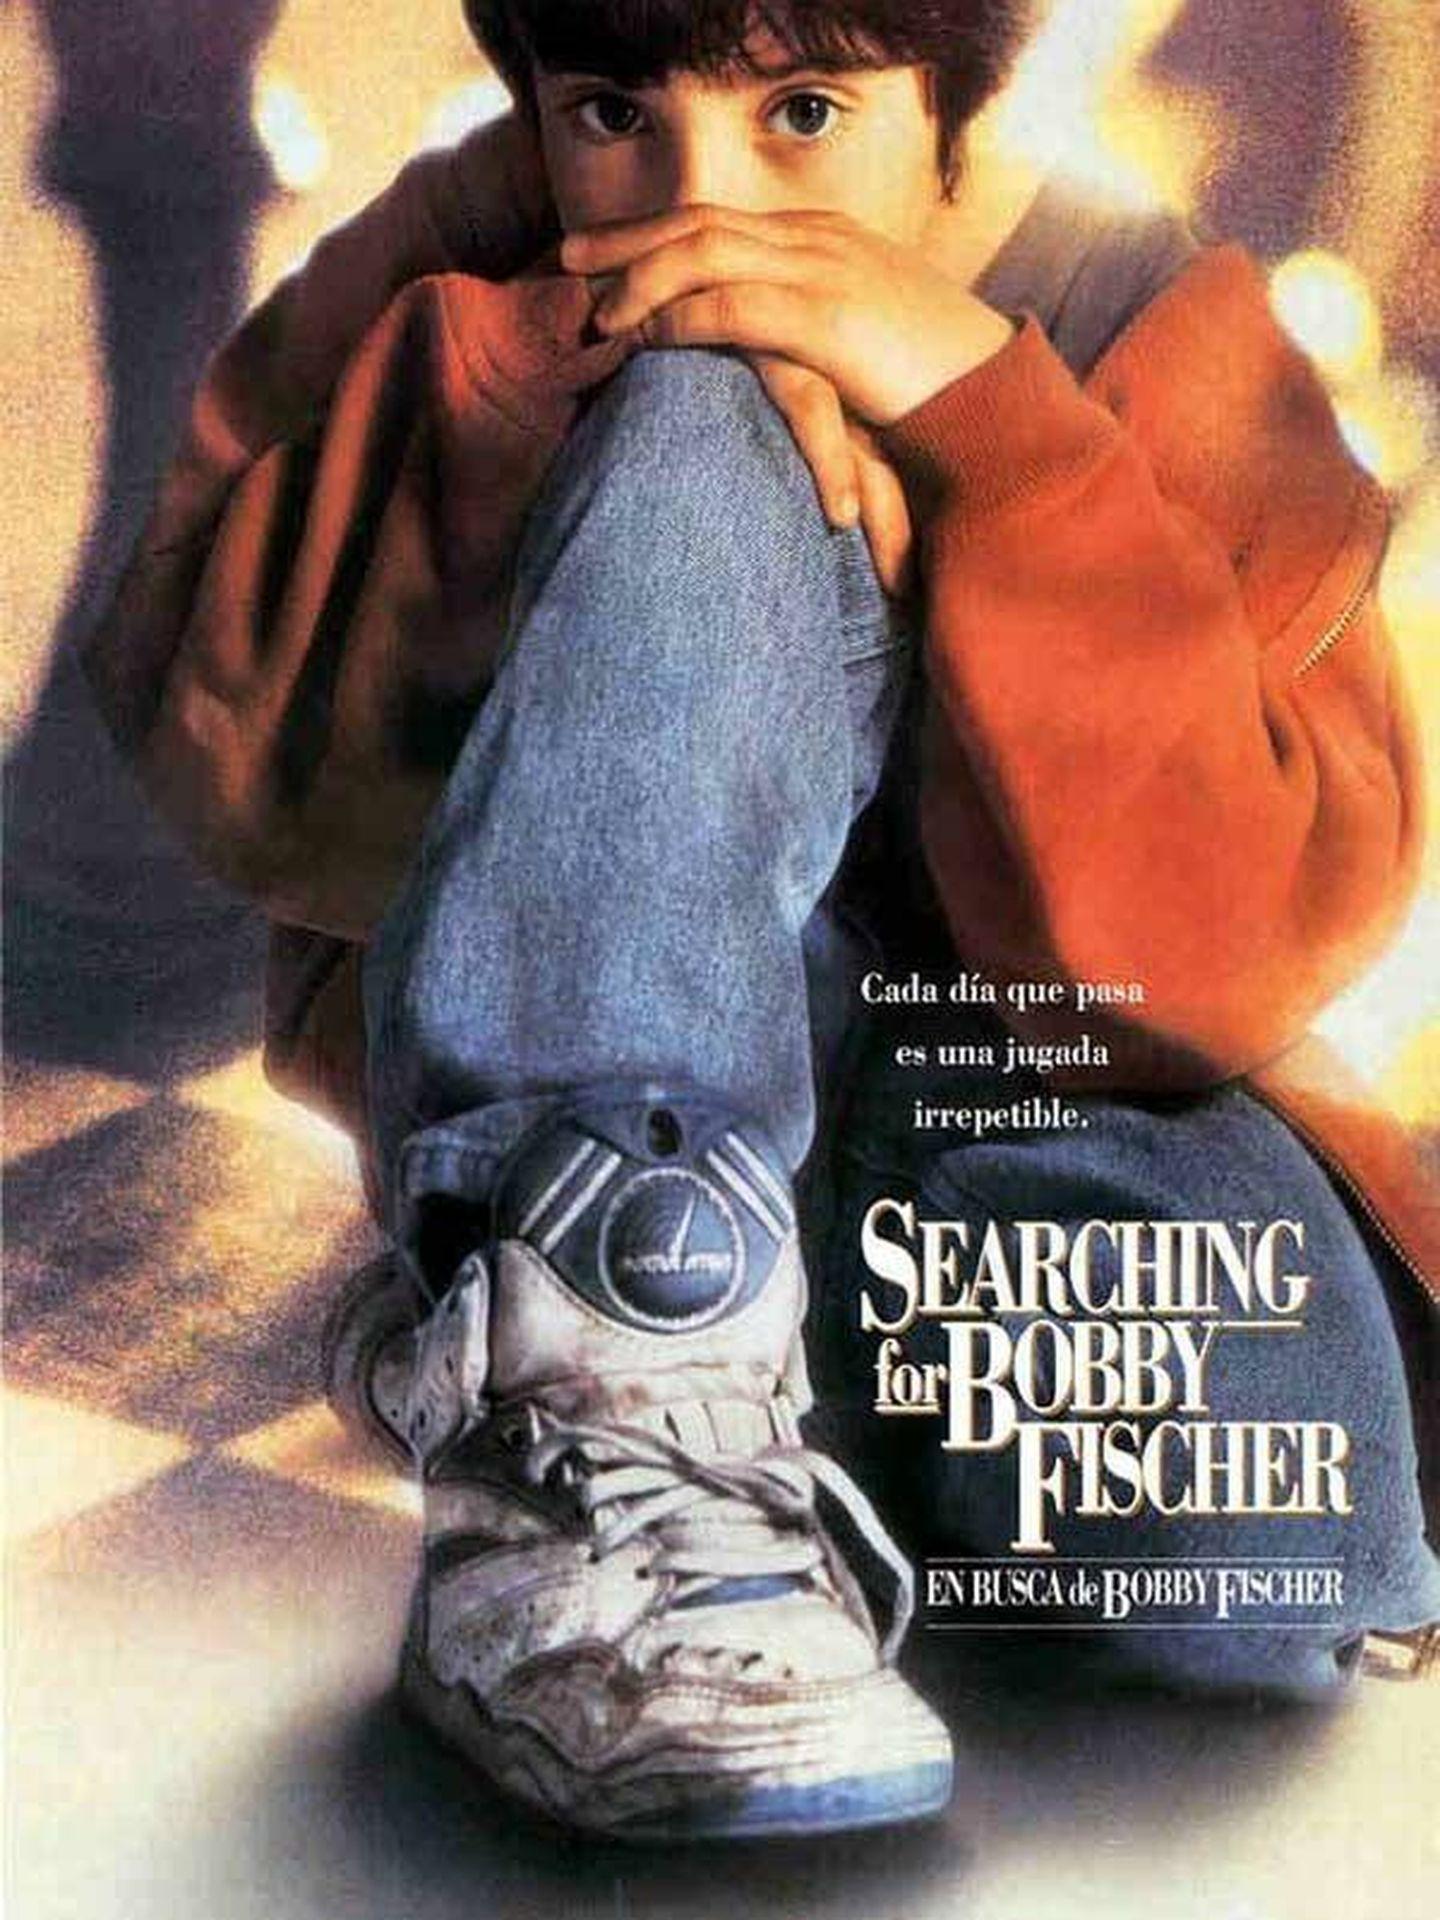 'En busca de Bobby Fischer', 1993.